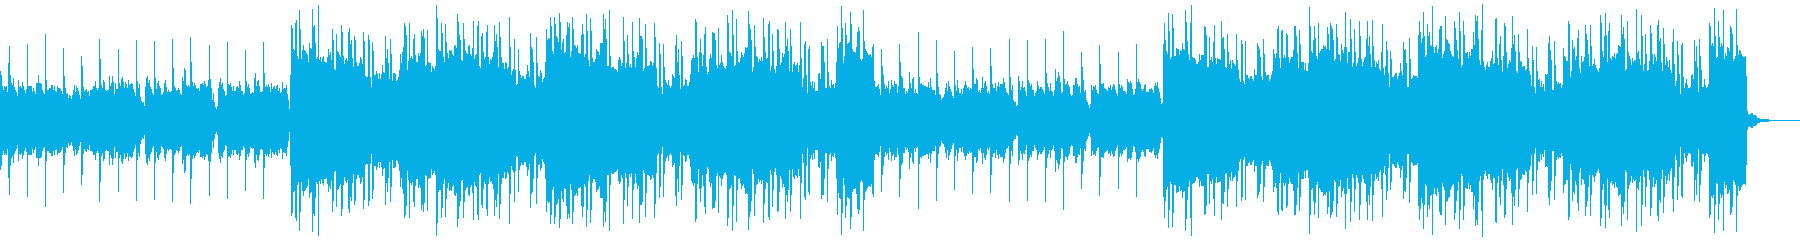 Japanese Chillhop 4の再生済みの波形